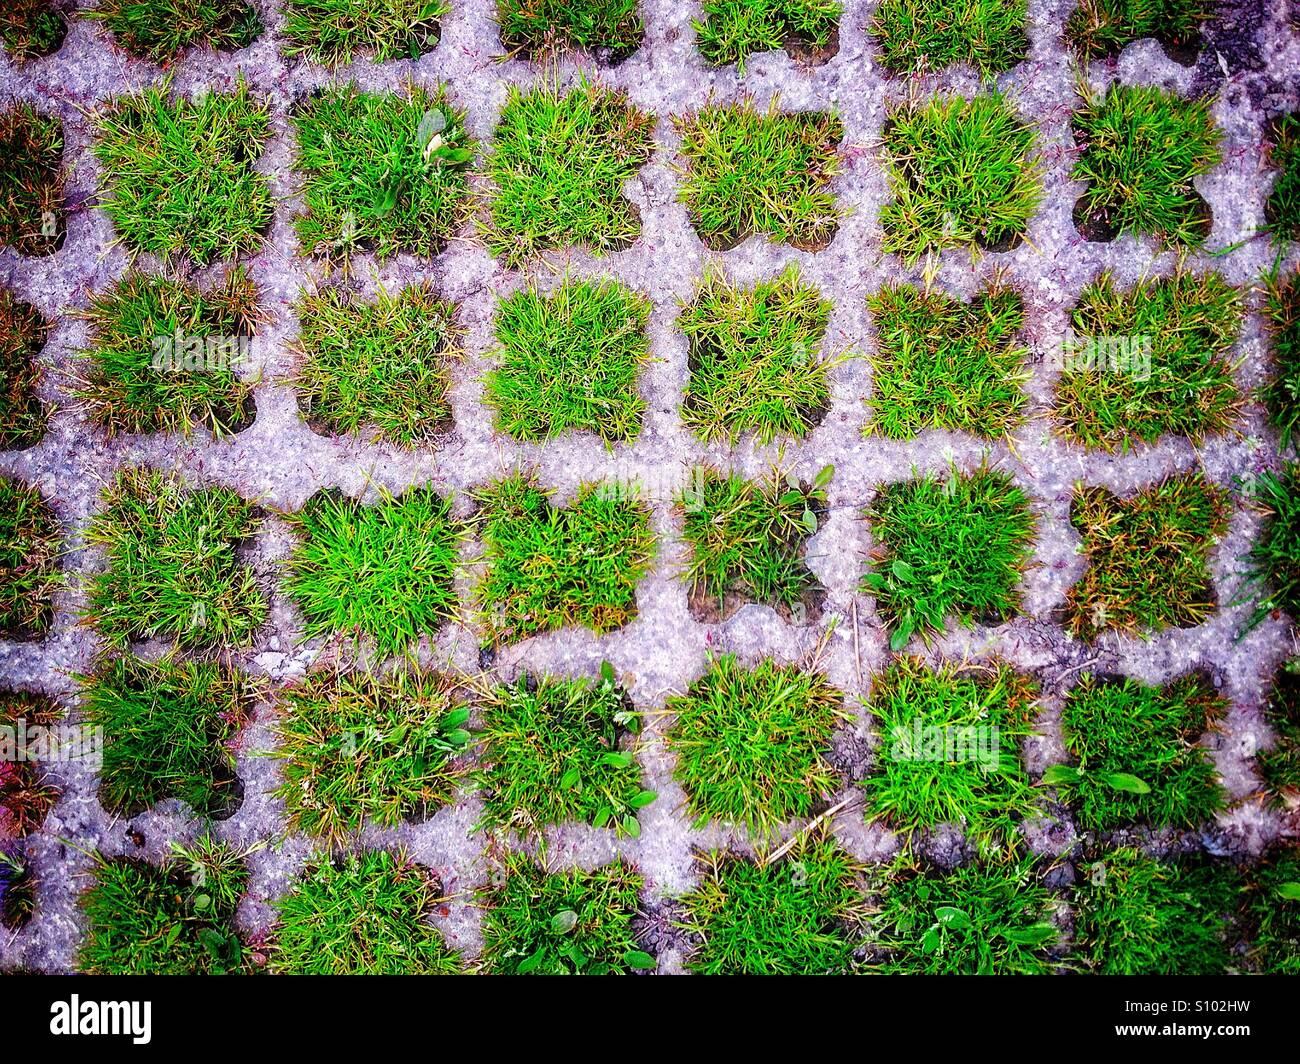 Grassy squares - Stock Image